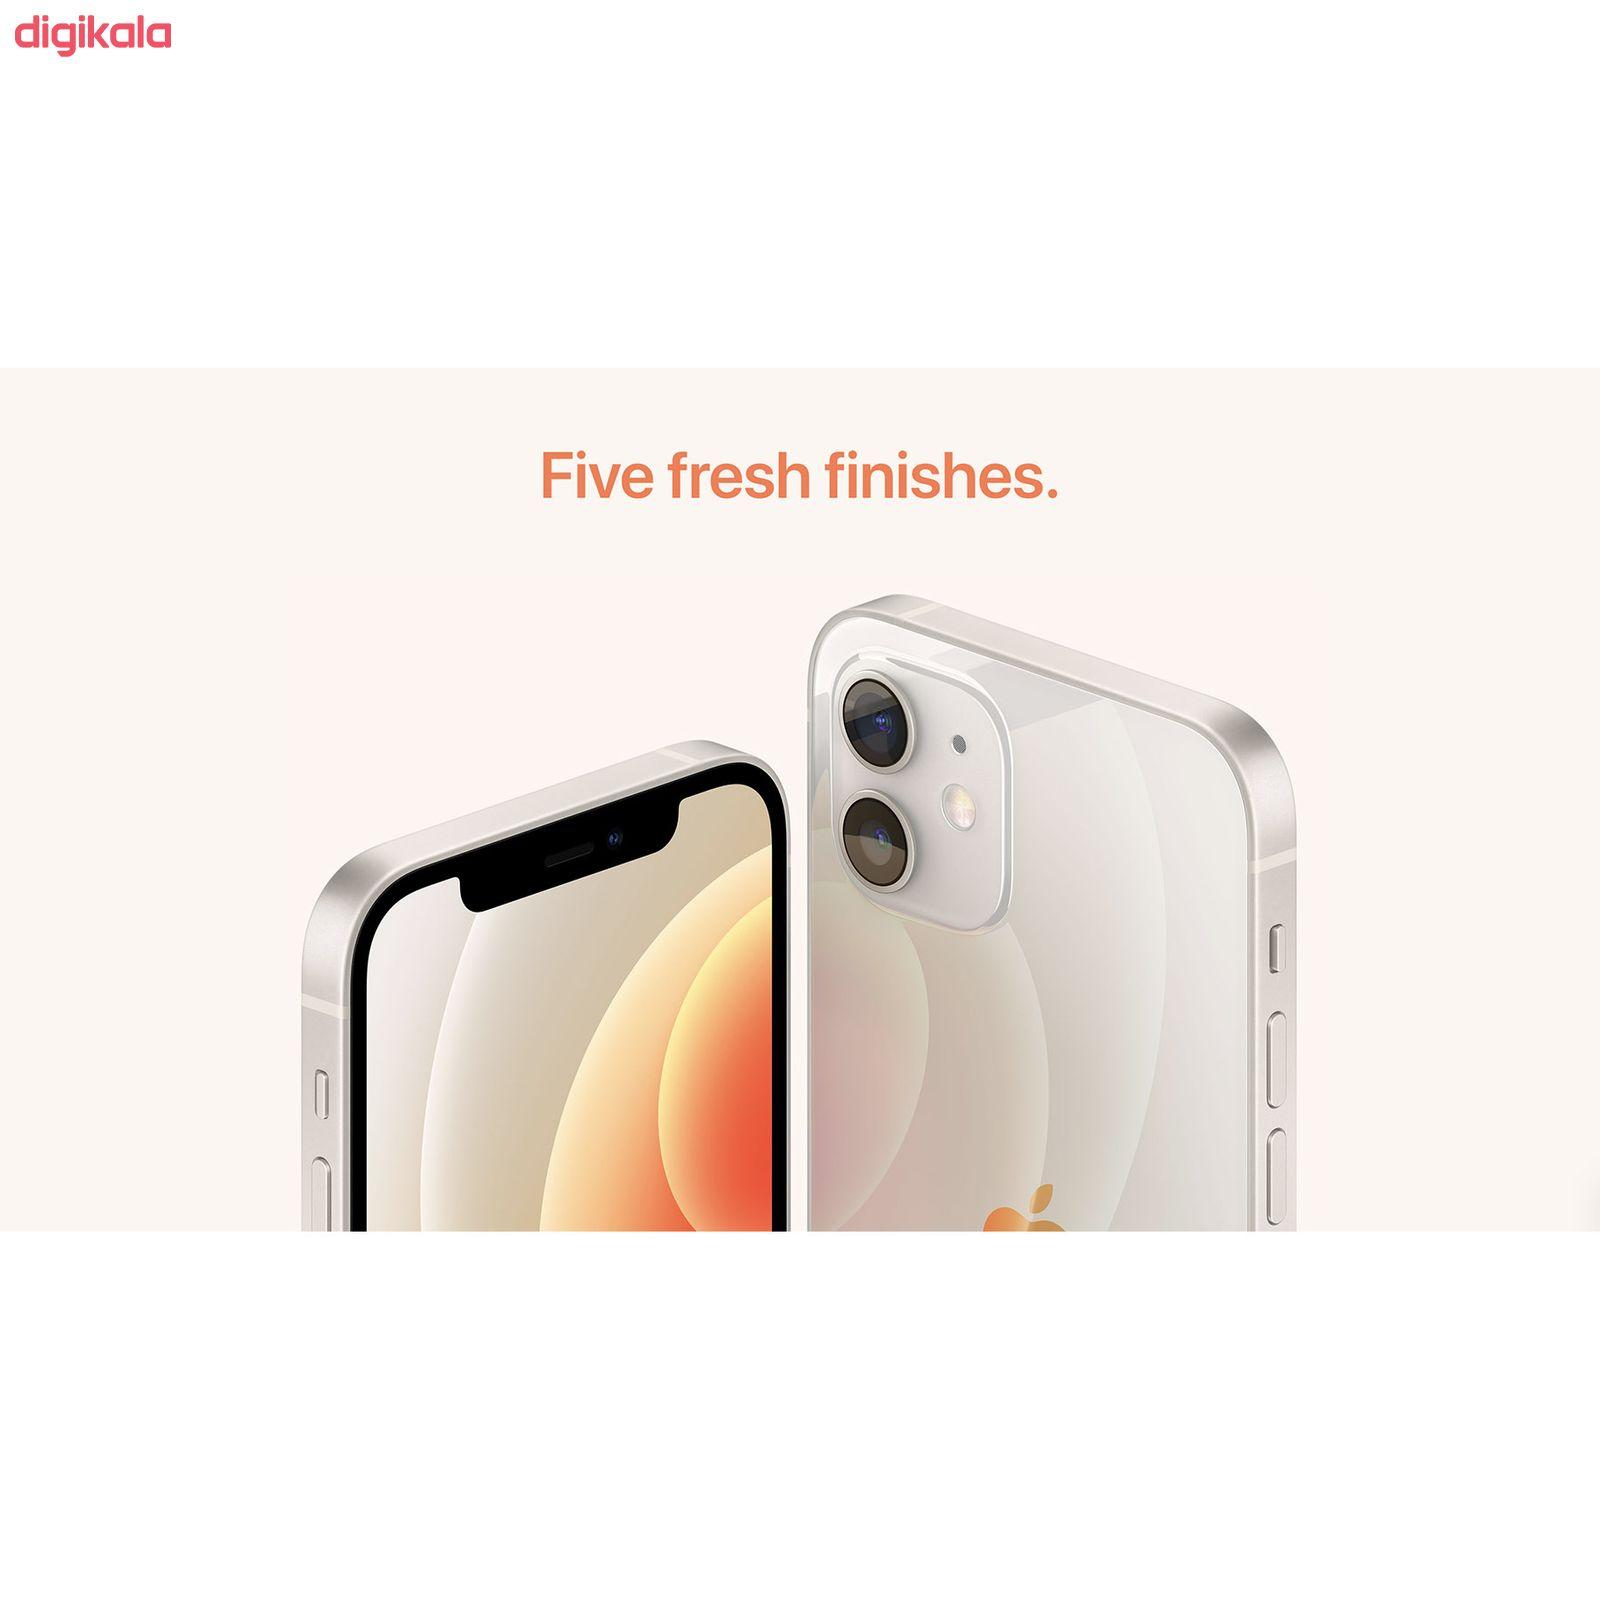 گوشی موبایل اپل مدل iPhone 12 A2404 دو سیم کارت ظرفیت 256 گیگابایت  main 1 9